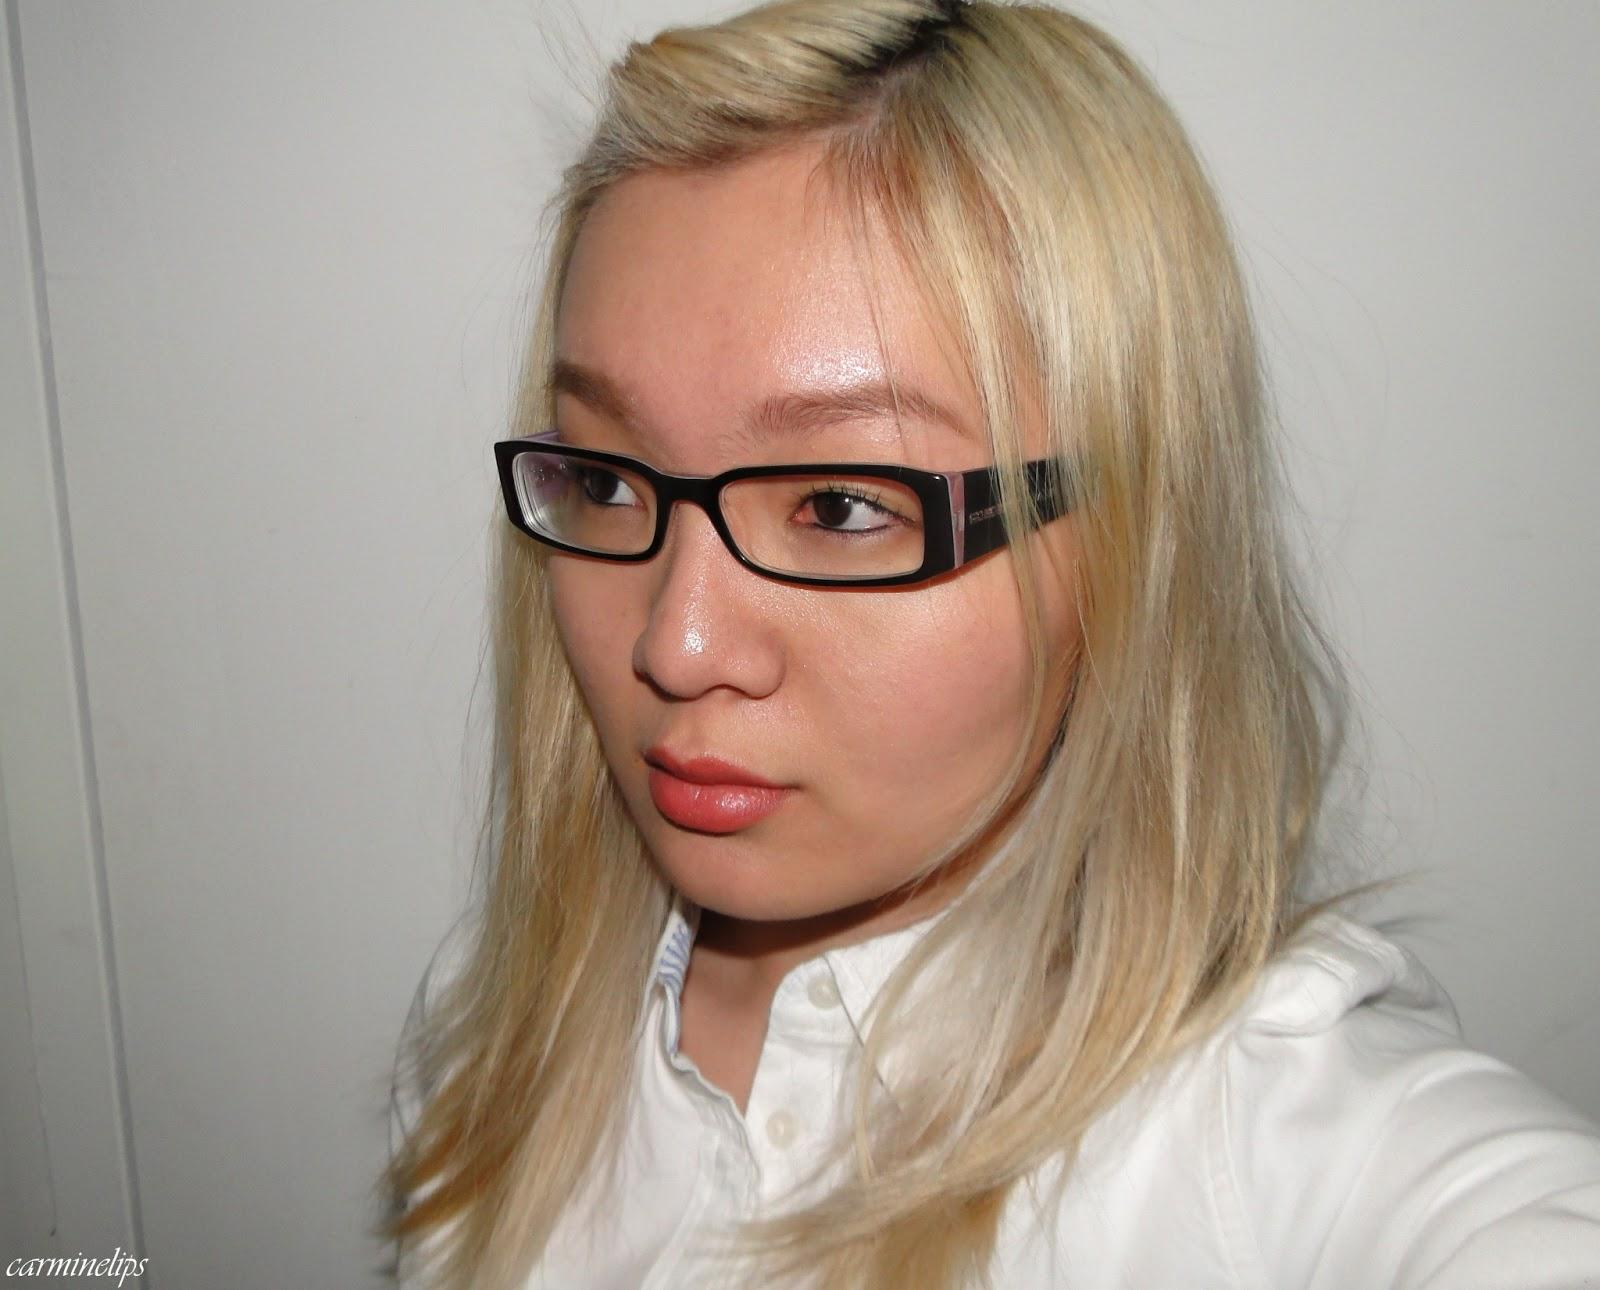 Hair, Part III: Level 7 (Medium Blonde) to Level 10 (Lightest Blonde